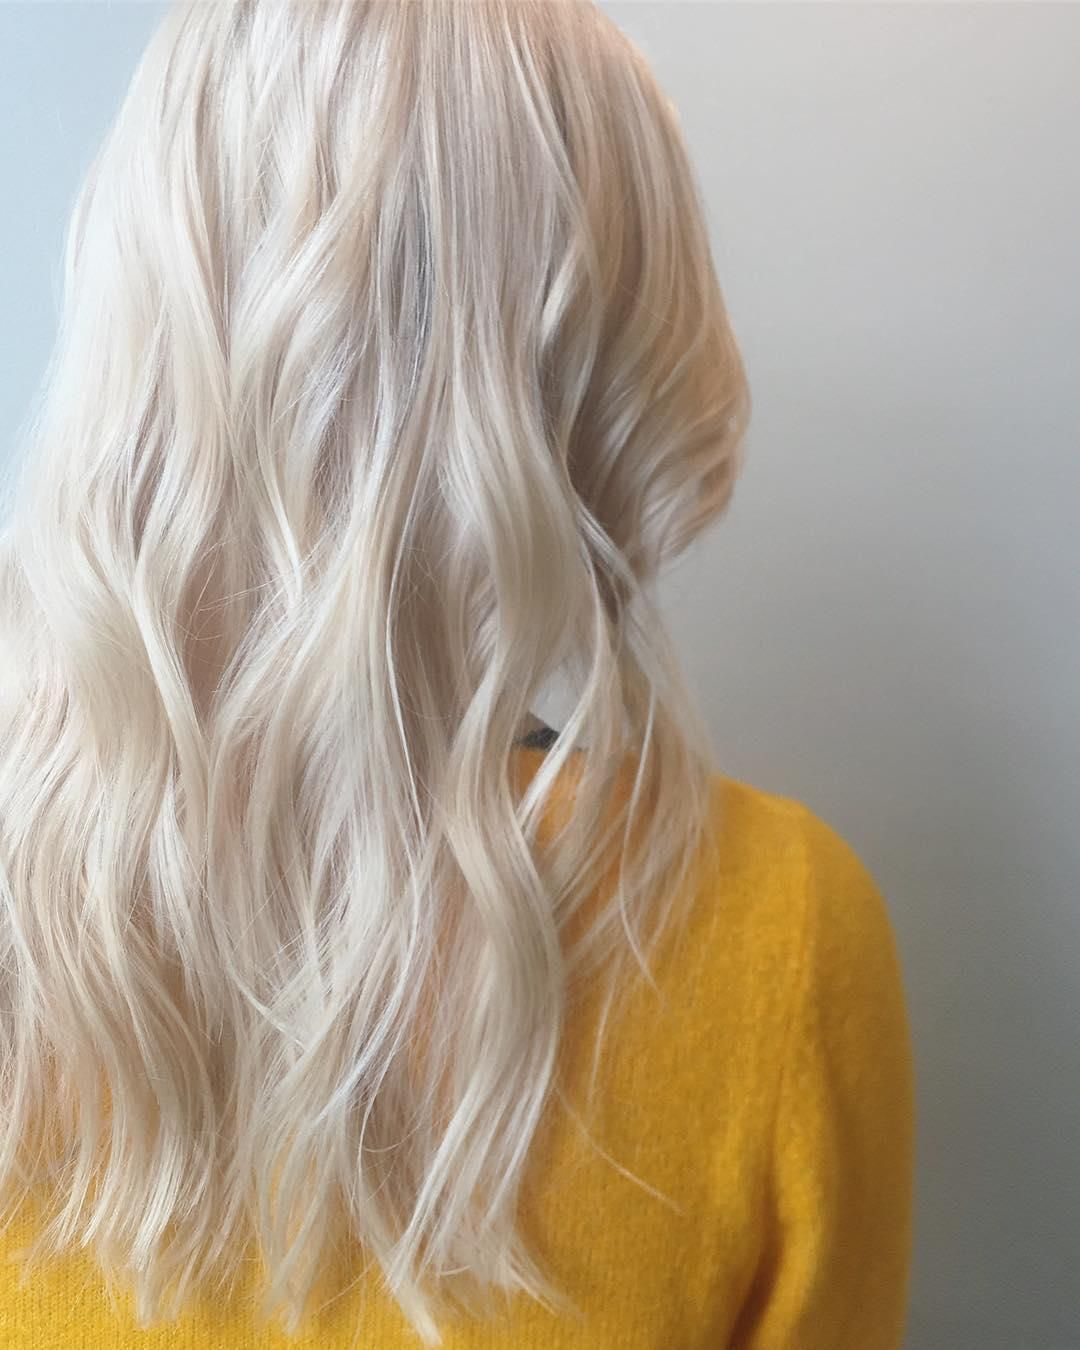 Matrix Tagged Posts Snow White Hair White Blonde Hair Platinum Blonde Hair